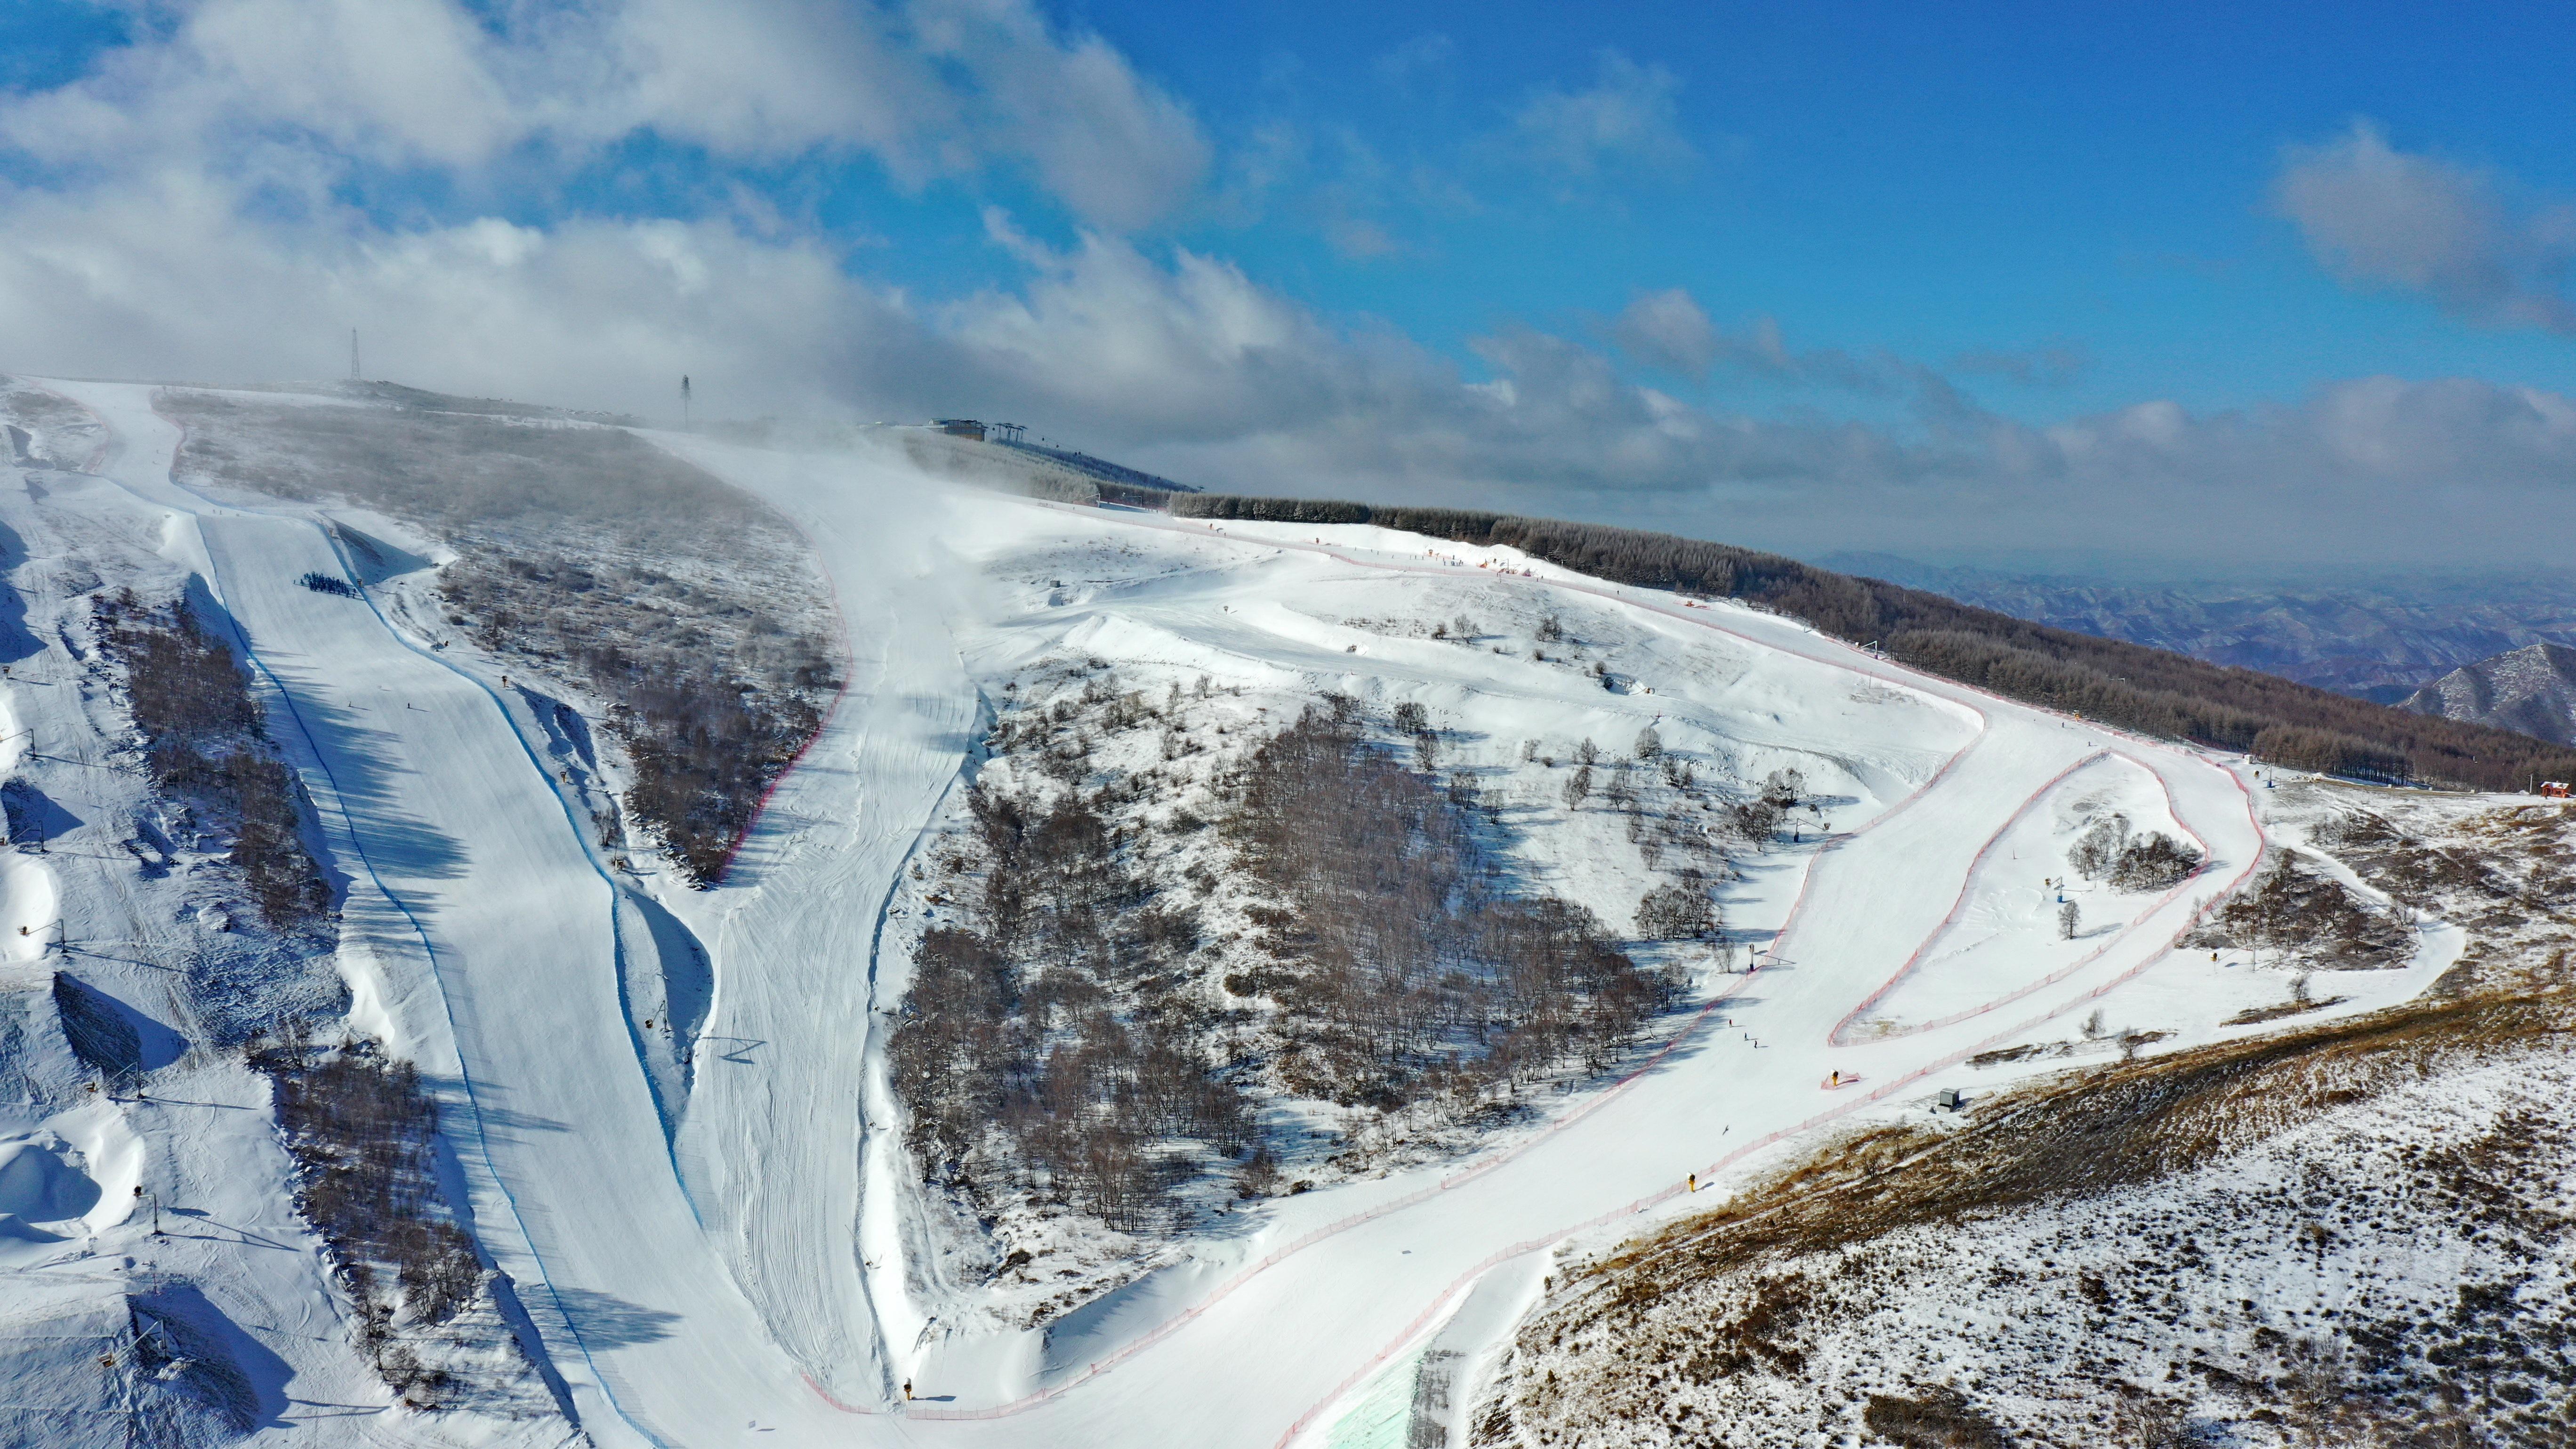 Diplomats visit 2022 Winter Olympics site in Zhangjiakou as the Games near